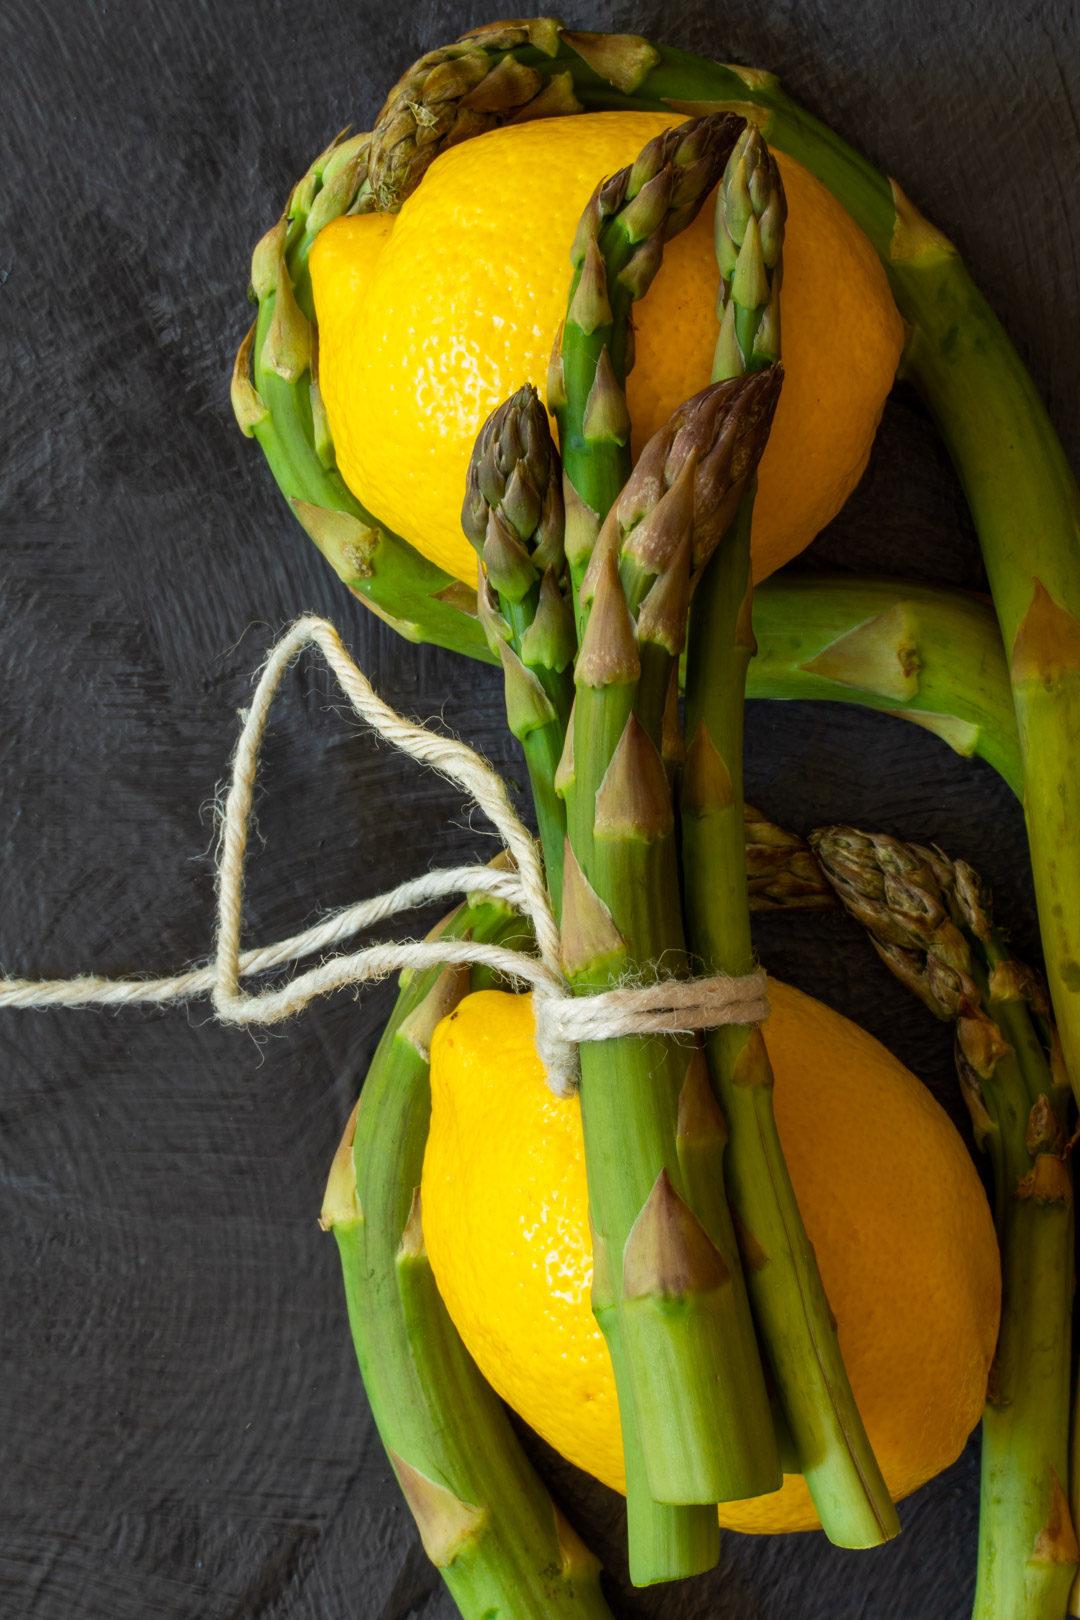 asparagus & lemon tart: asparagus and lemon still life flatlay